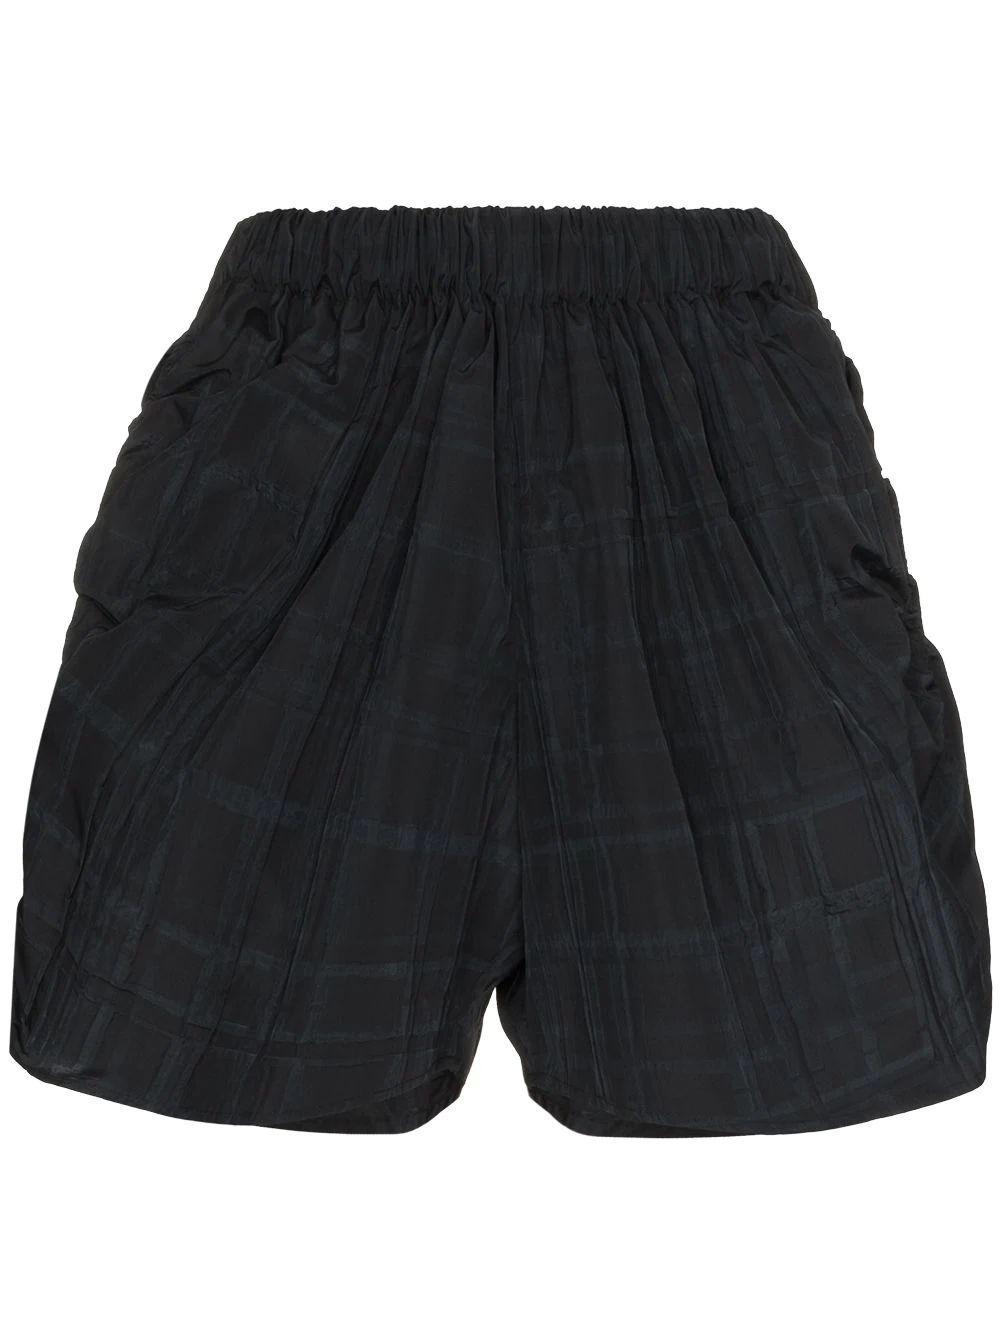 Izzie Recycled Taffeta Shorts Item # SS21-050